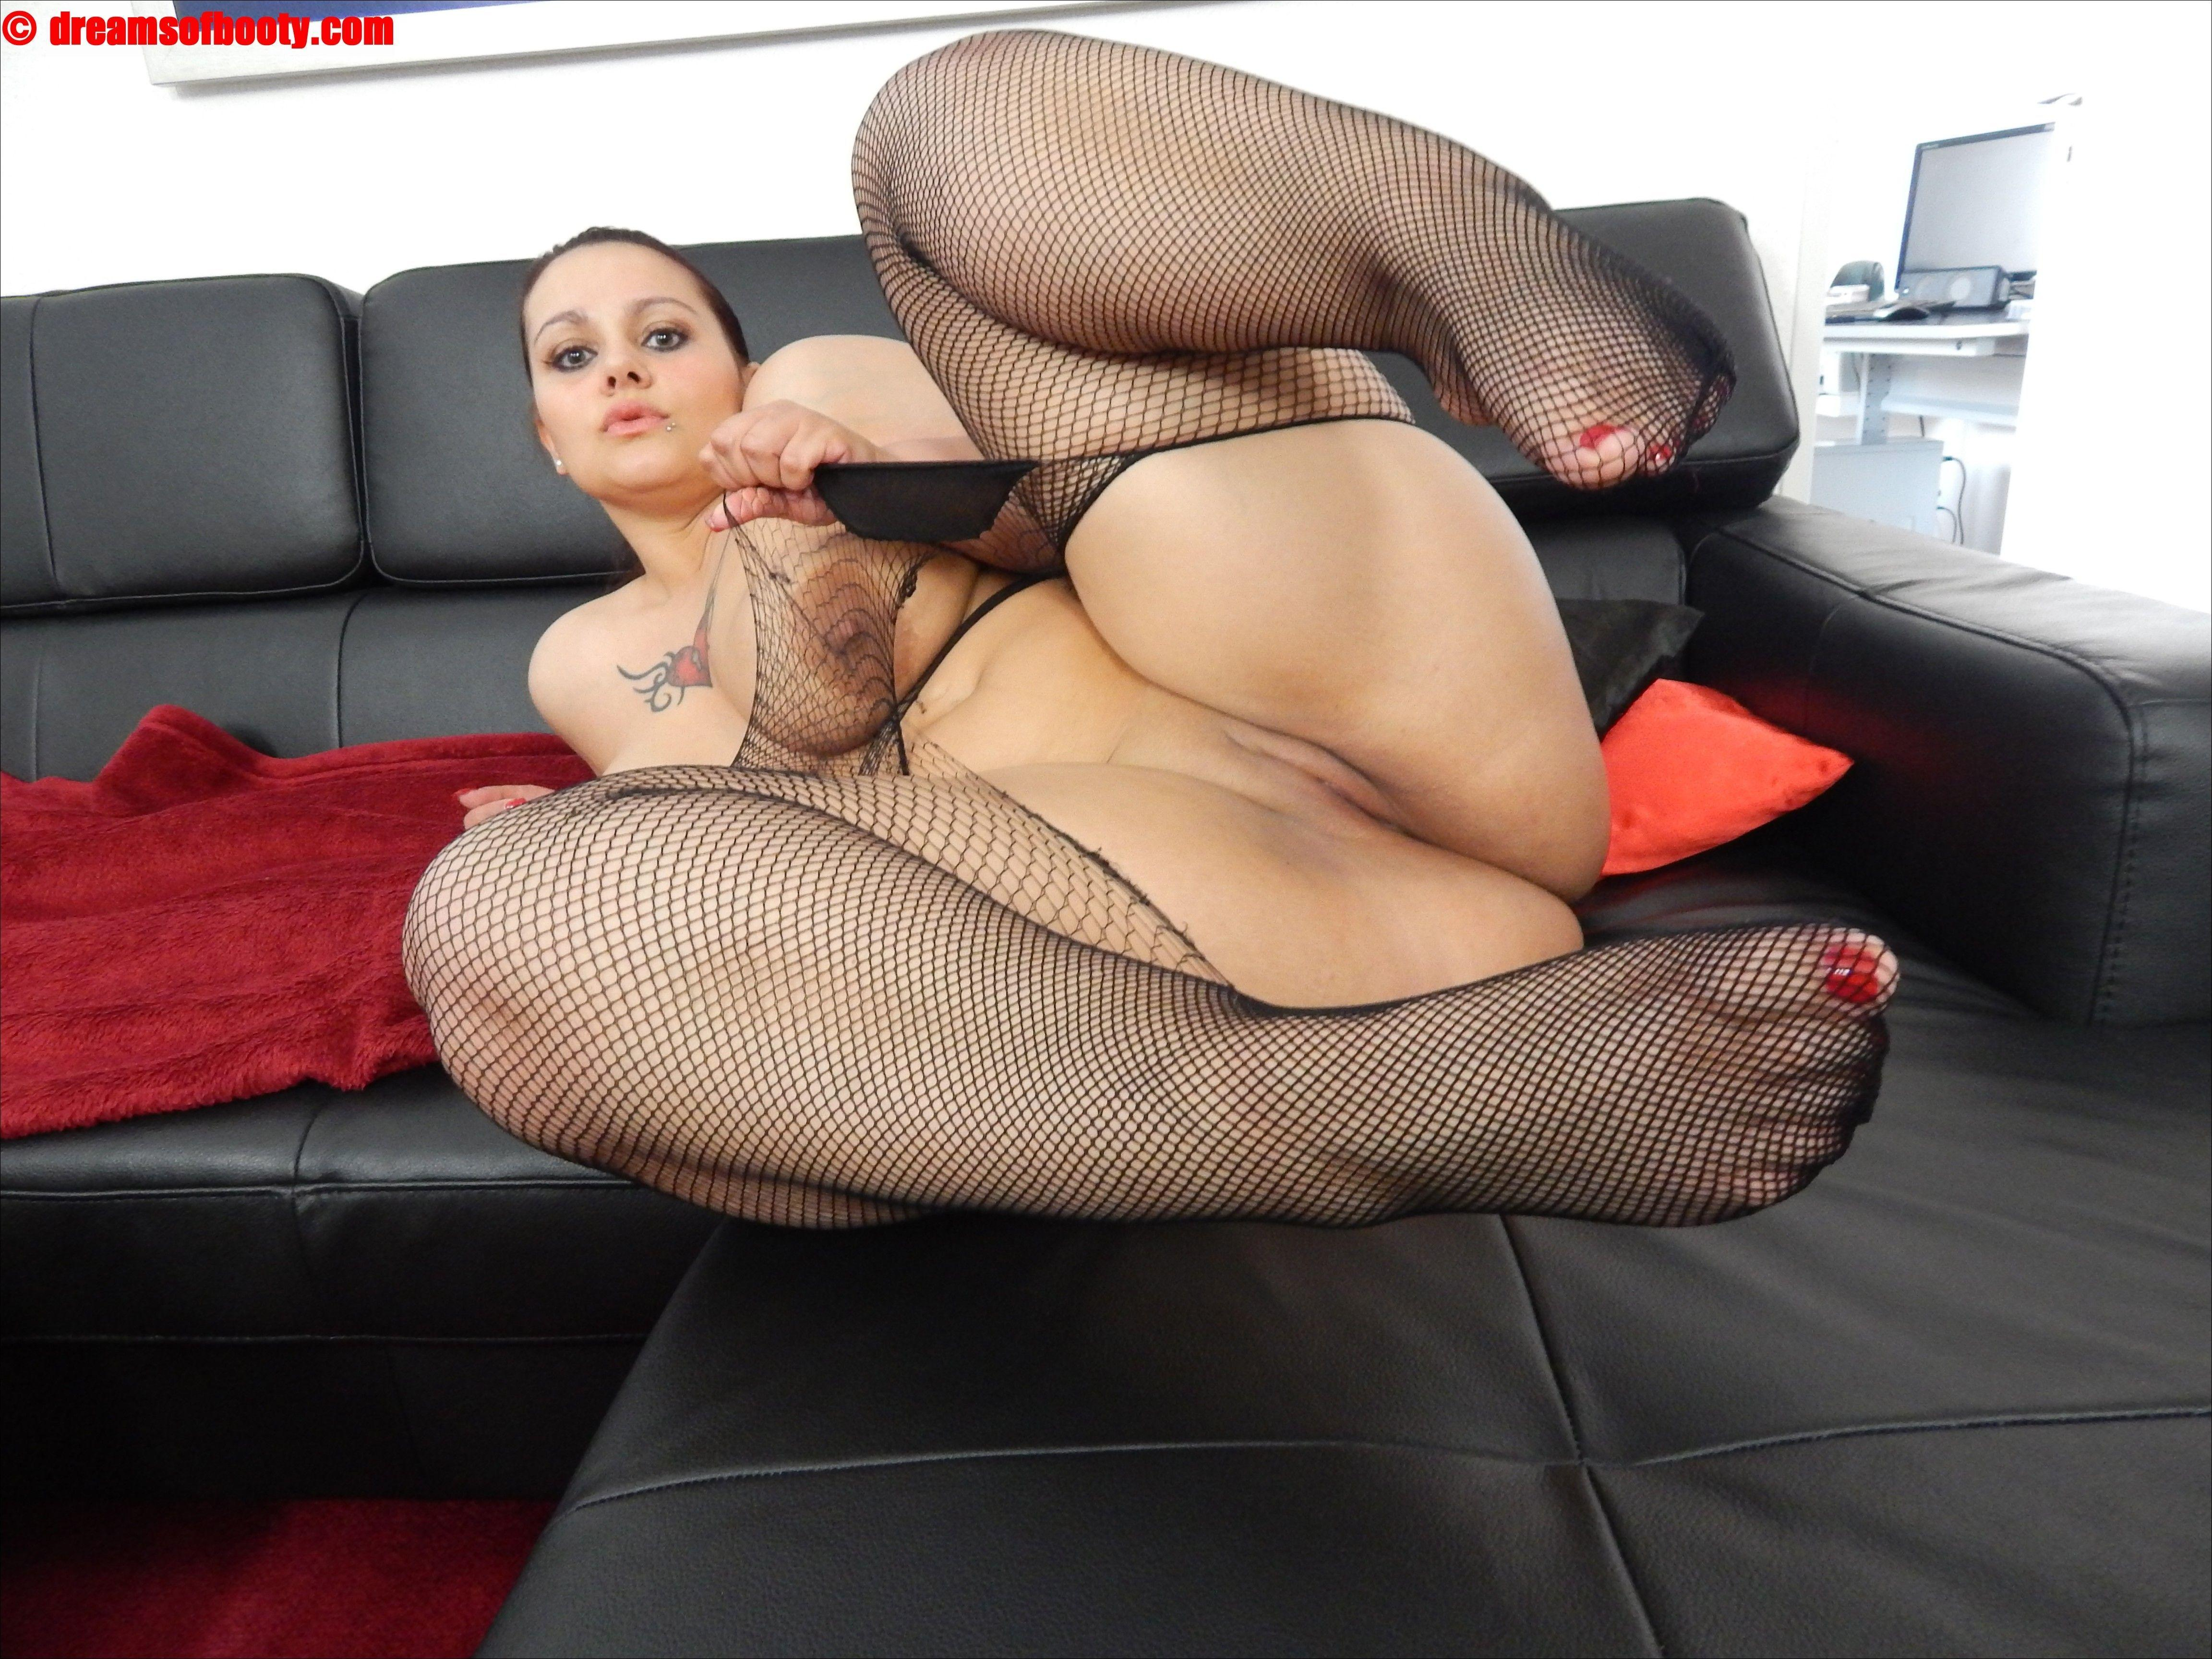 Persi sexy girl pic xxx